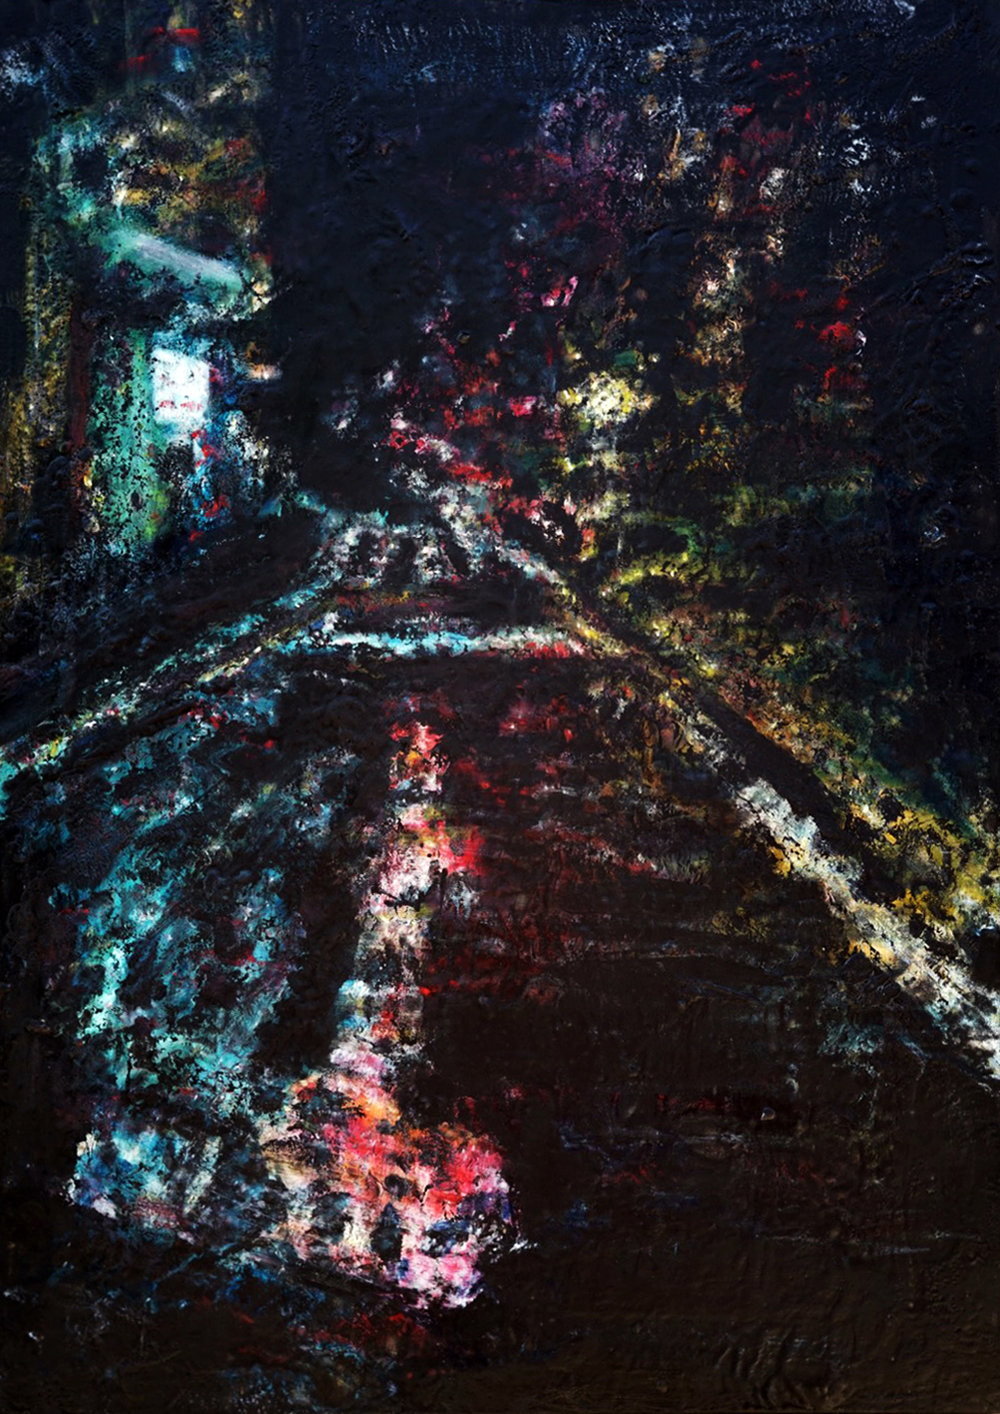 Dark Night of the Soul: Stop